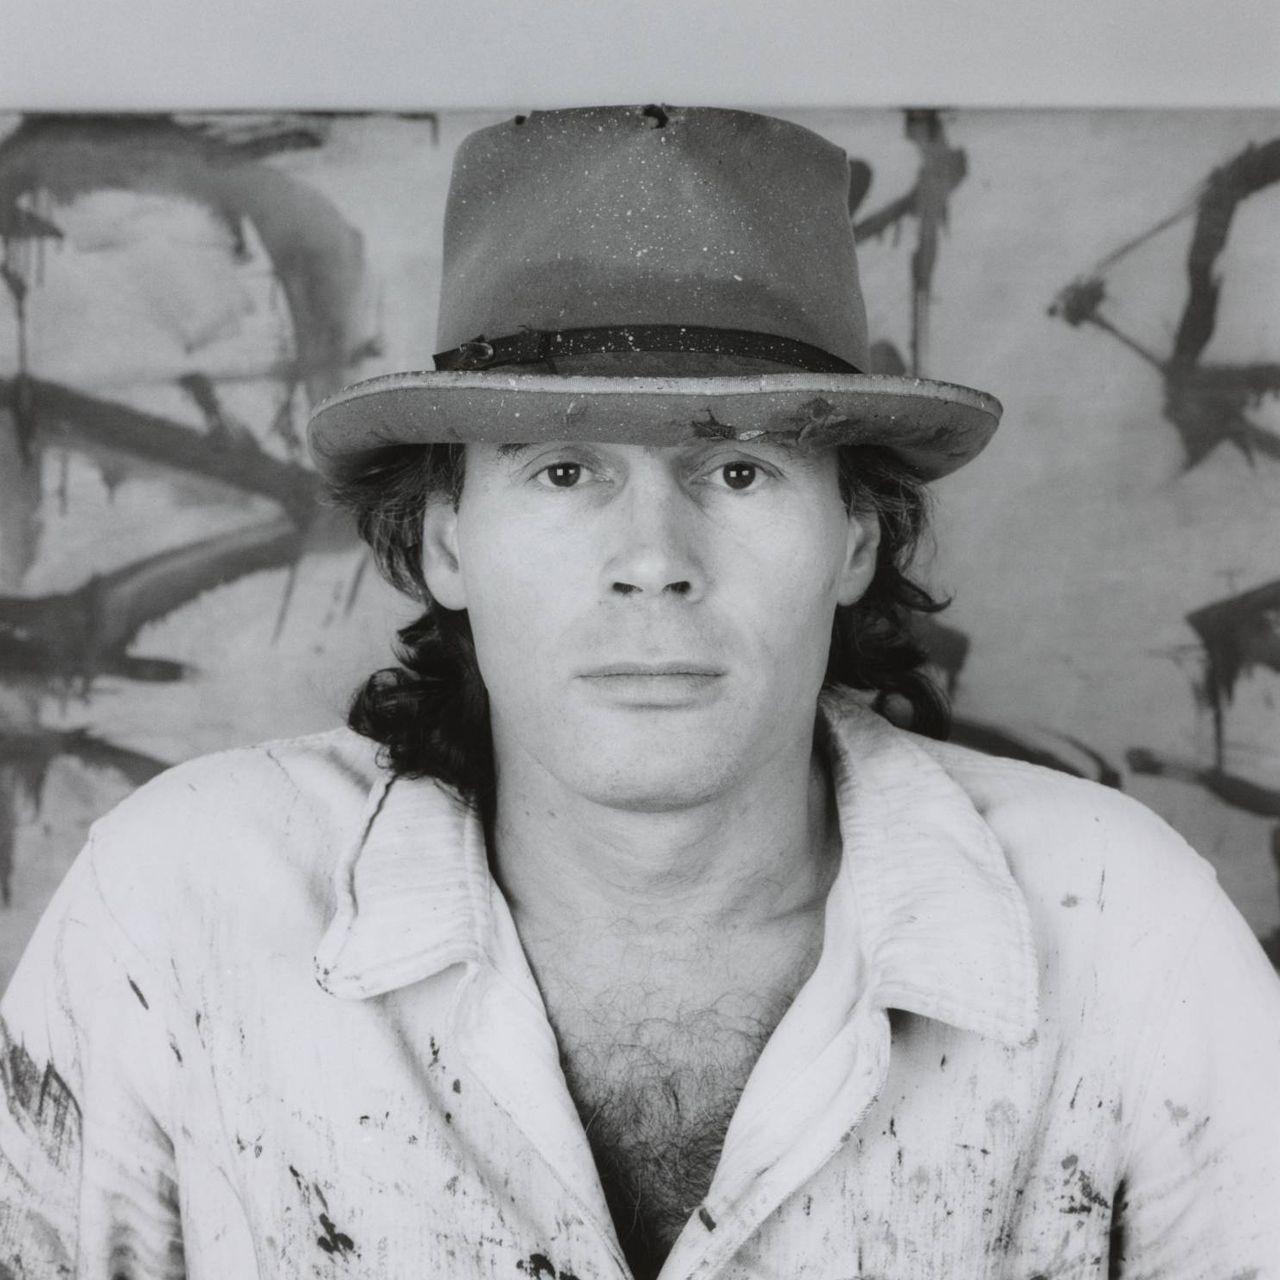 "arpeggia: "" Portraits by Robert Mapplethorpe Top to bottom: Willem de Kooning, 1986; Louise Bourgeois, 1982; Keith Haring, 1984; Andy Warhol, 1983; Roy Lichtenstein, 1985; Robert Rauschenberg, 1983;..."